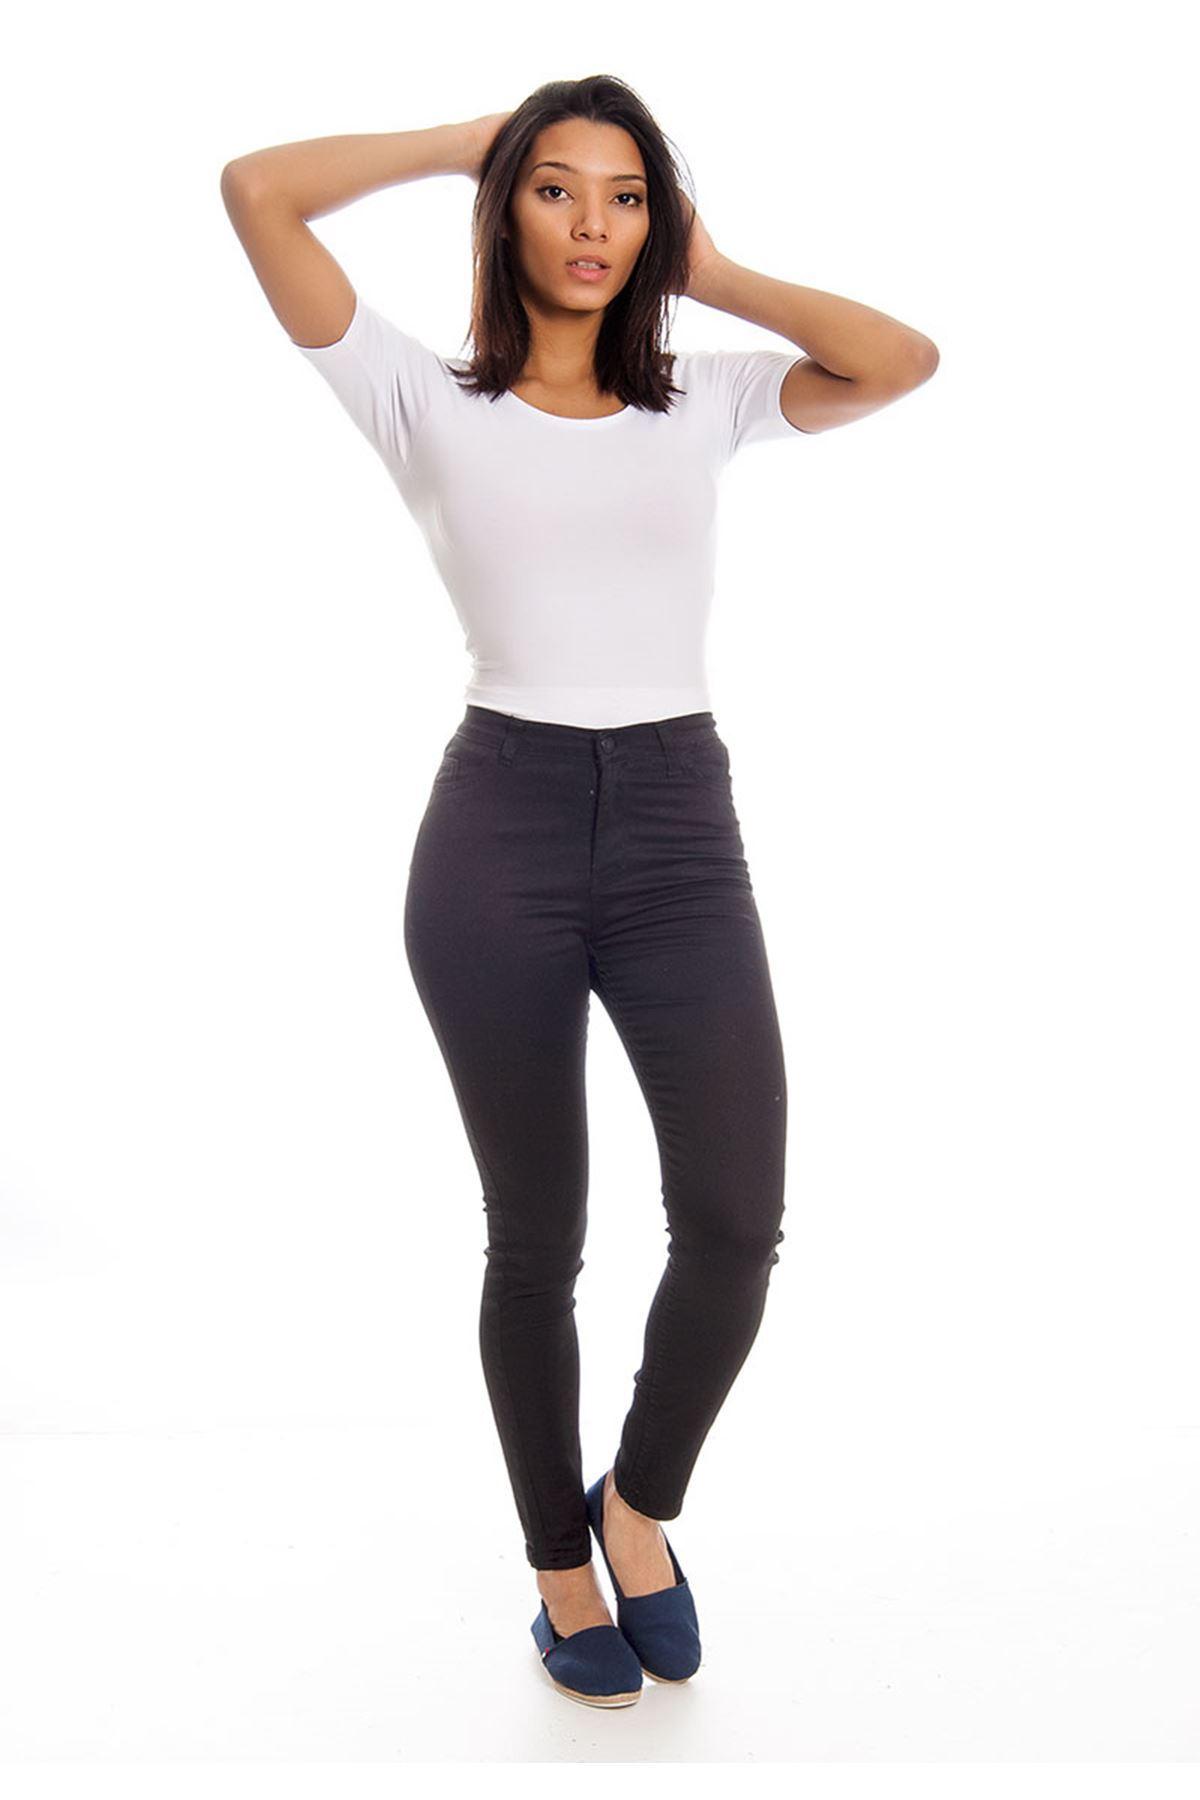 Siyah Dar Paça Yüksel Bel Kadın Pantolon 4A-126087